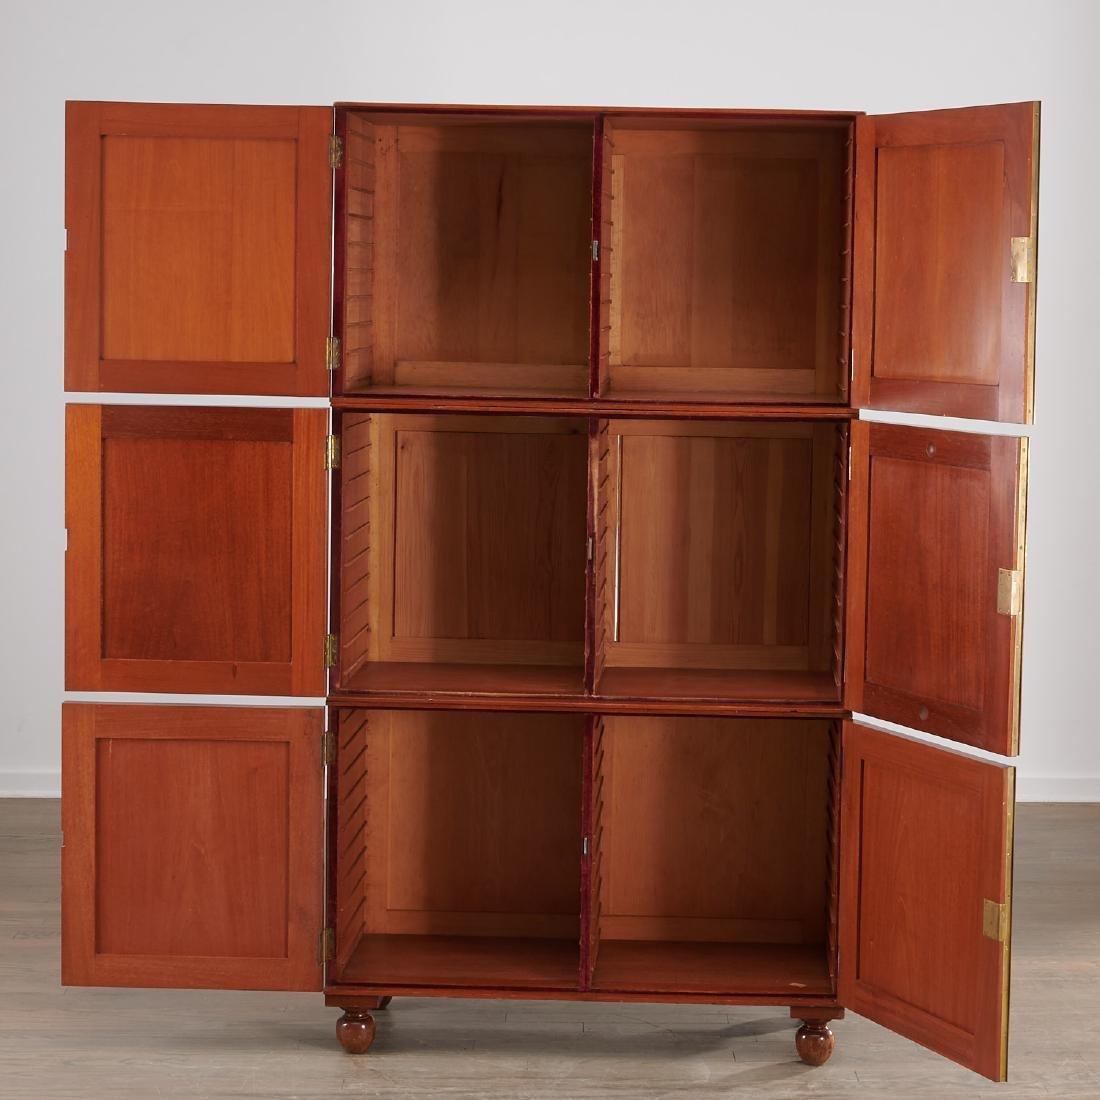 British Museum specimen cabinet by W. Cubitt & Co - 4